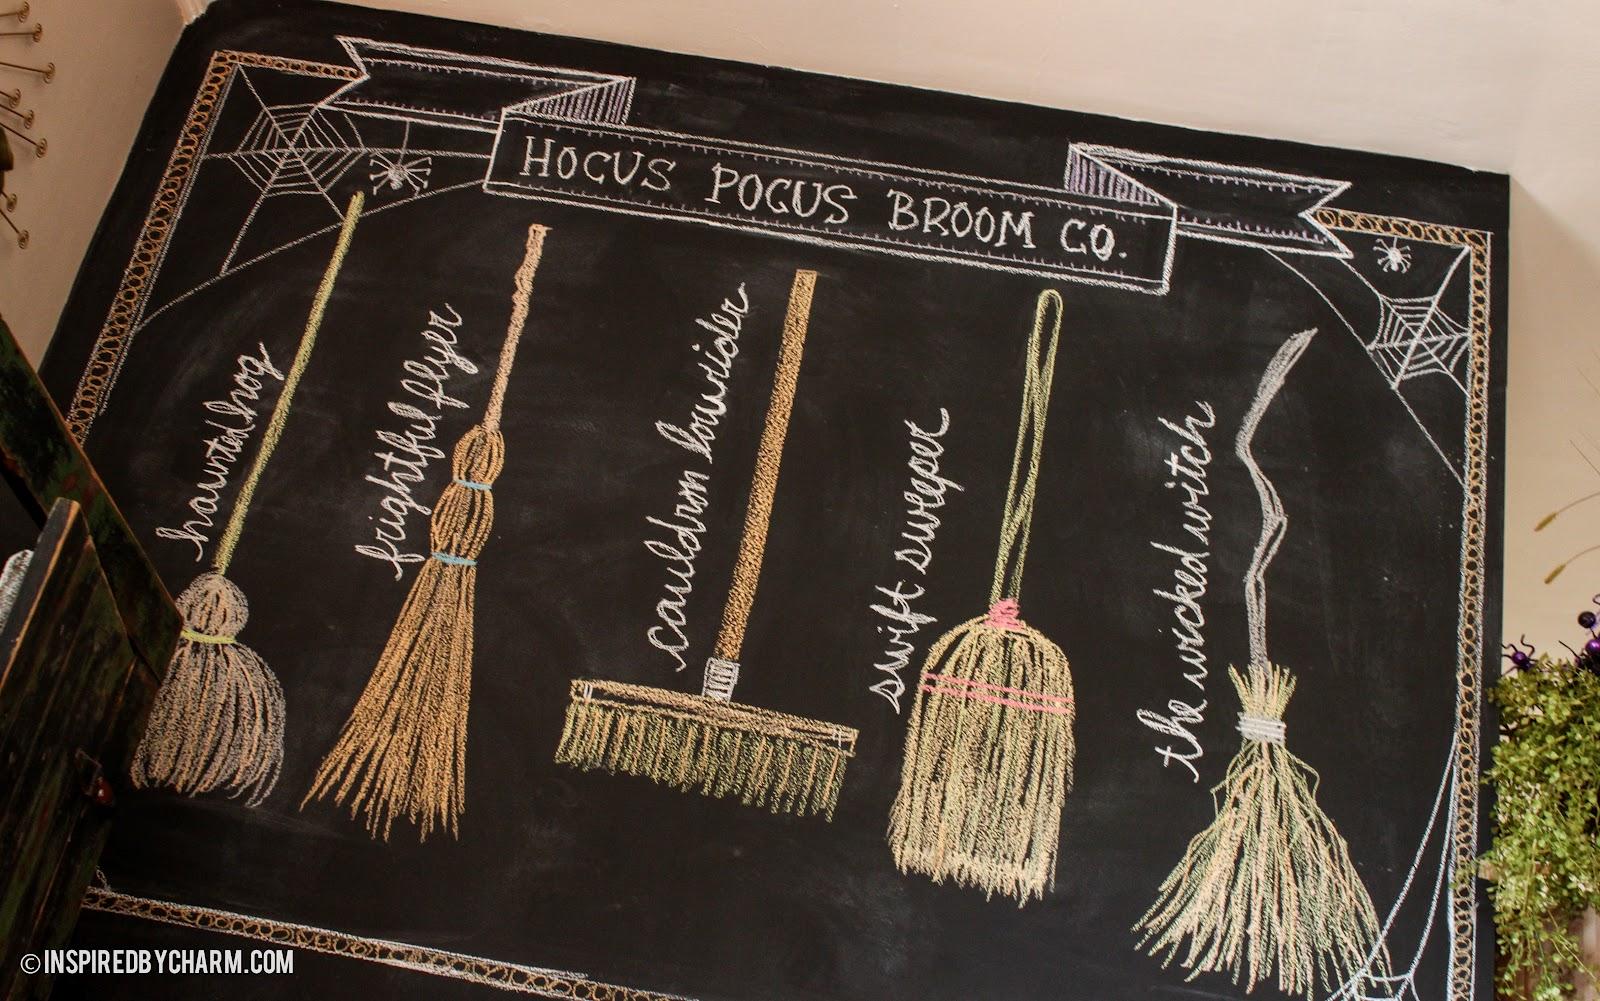 Harry Potter Wall Mural Hocus Pocus Broom Co